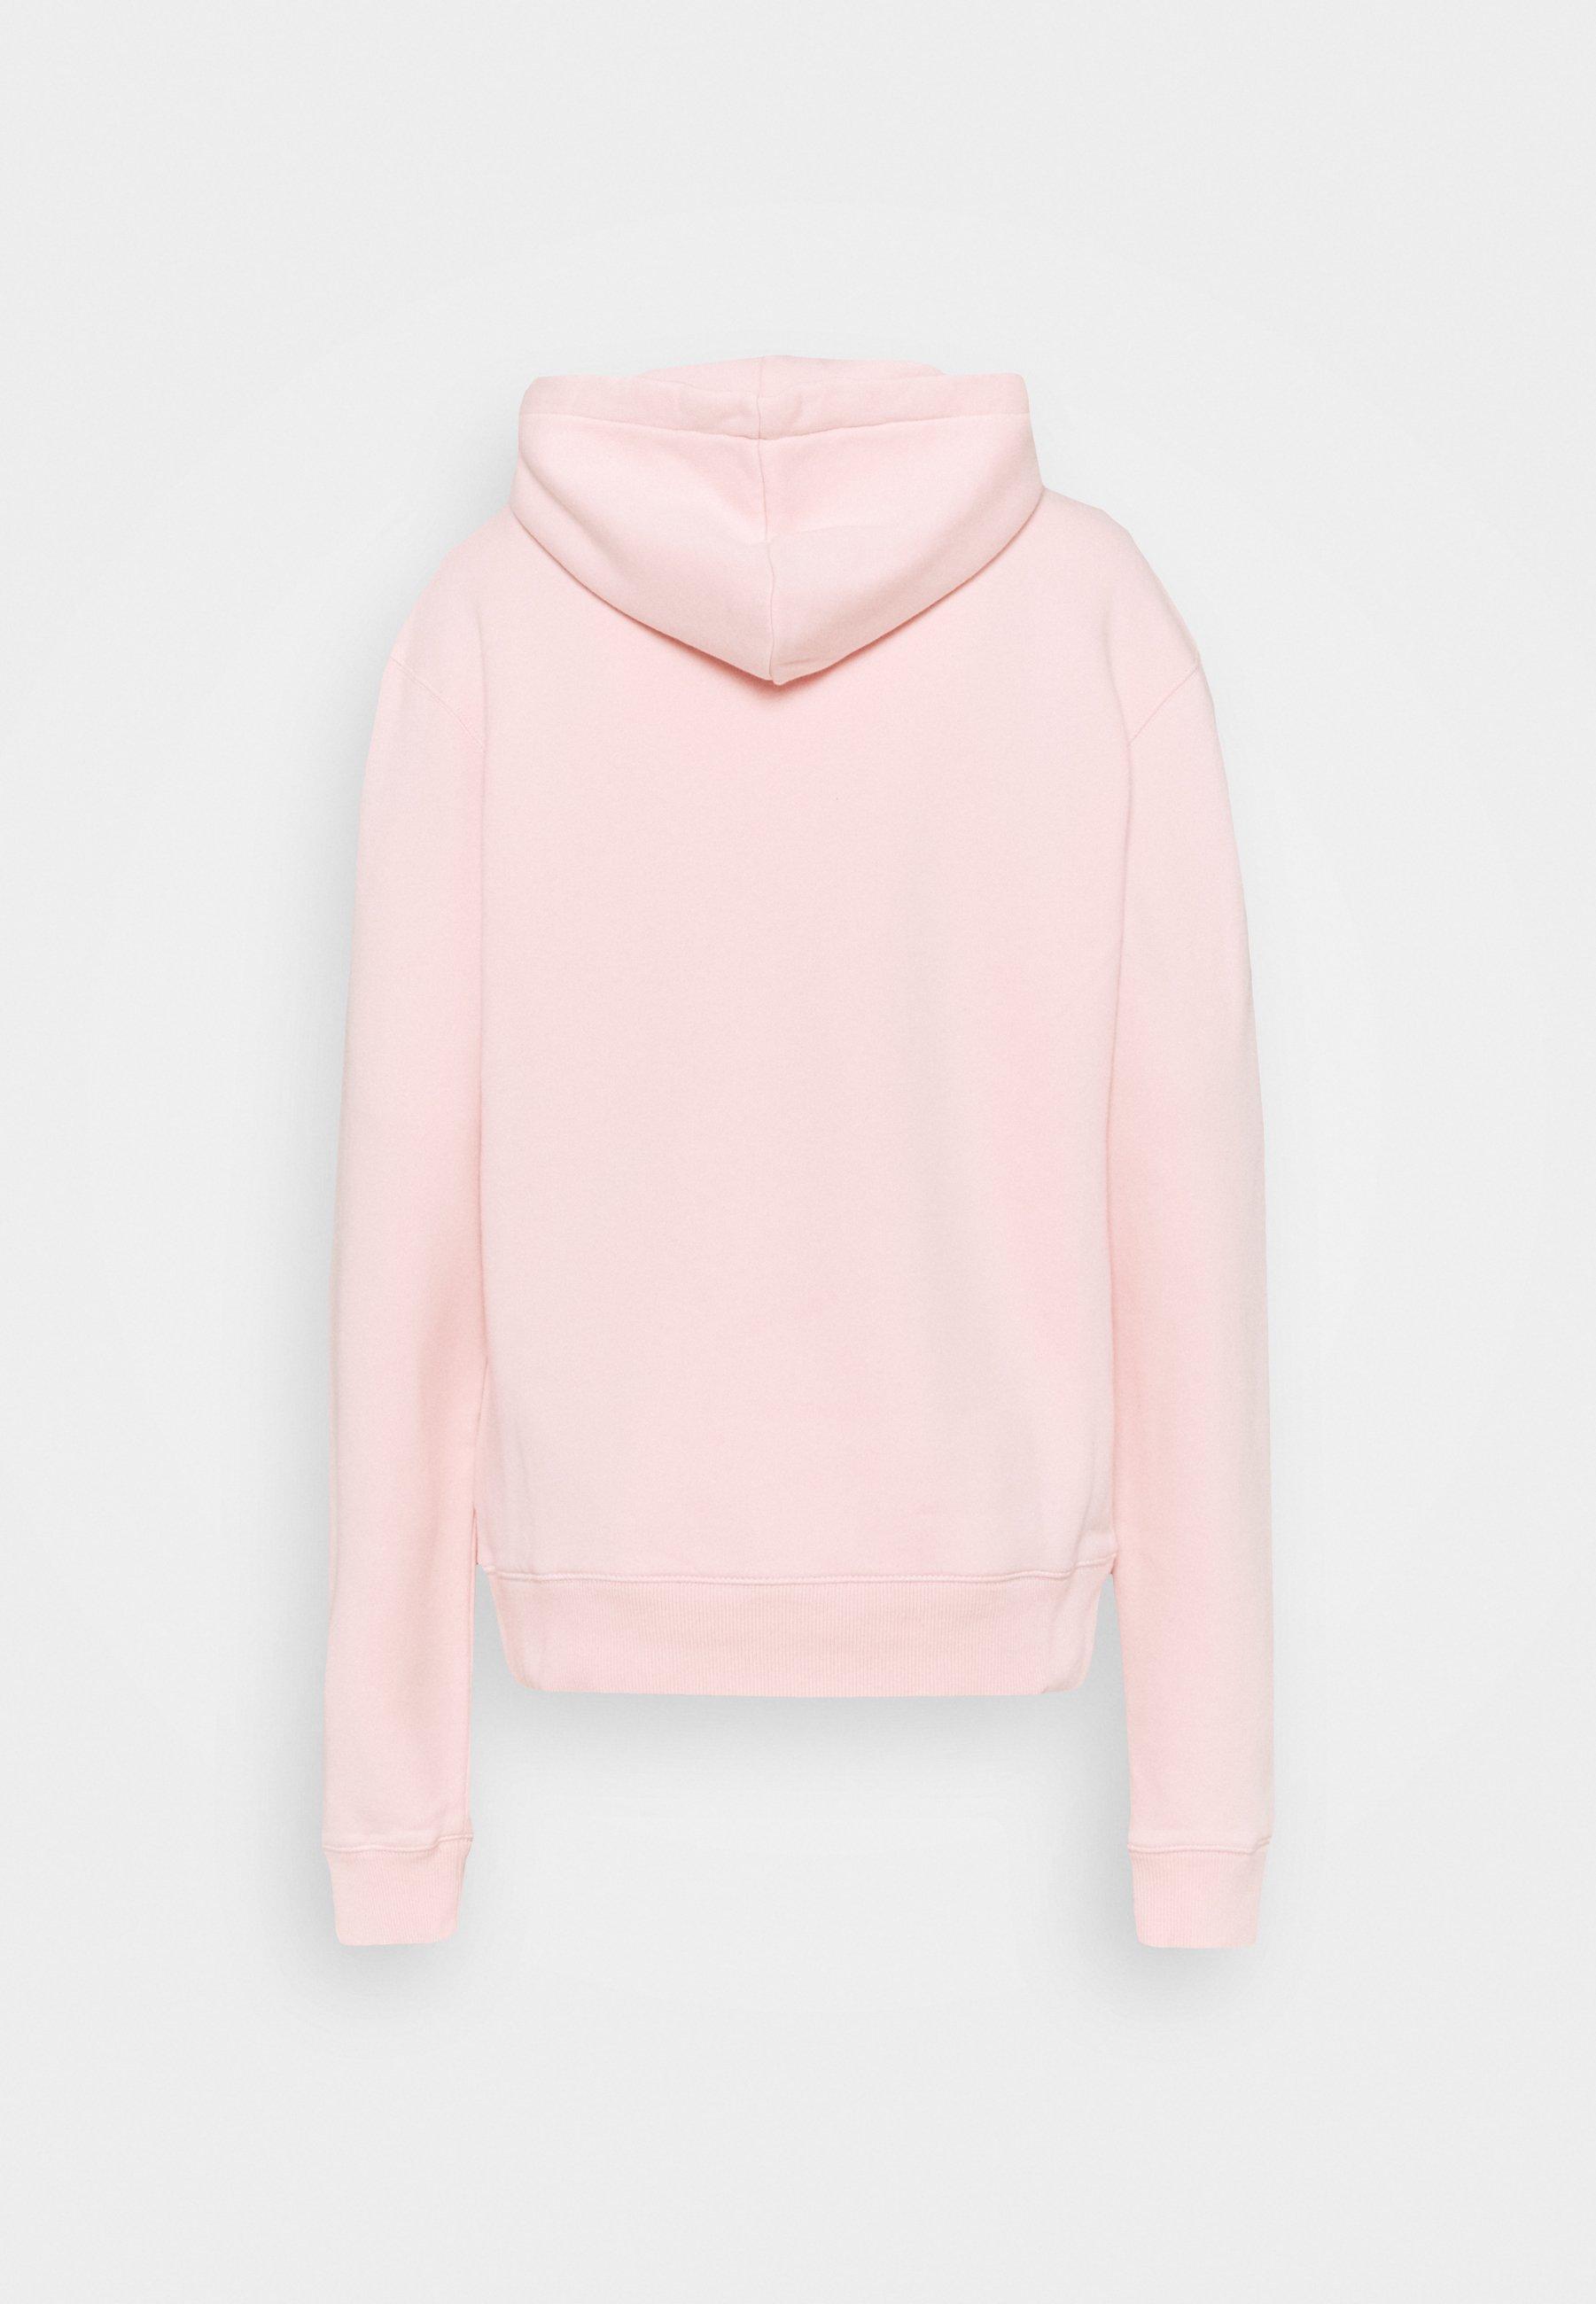 Fiorucci Icon Angels Hoodie - Sweatshirt Pale Pink/rosa